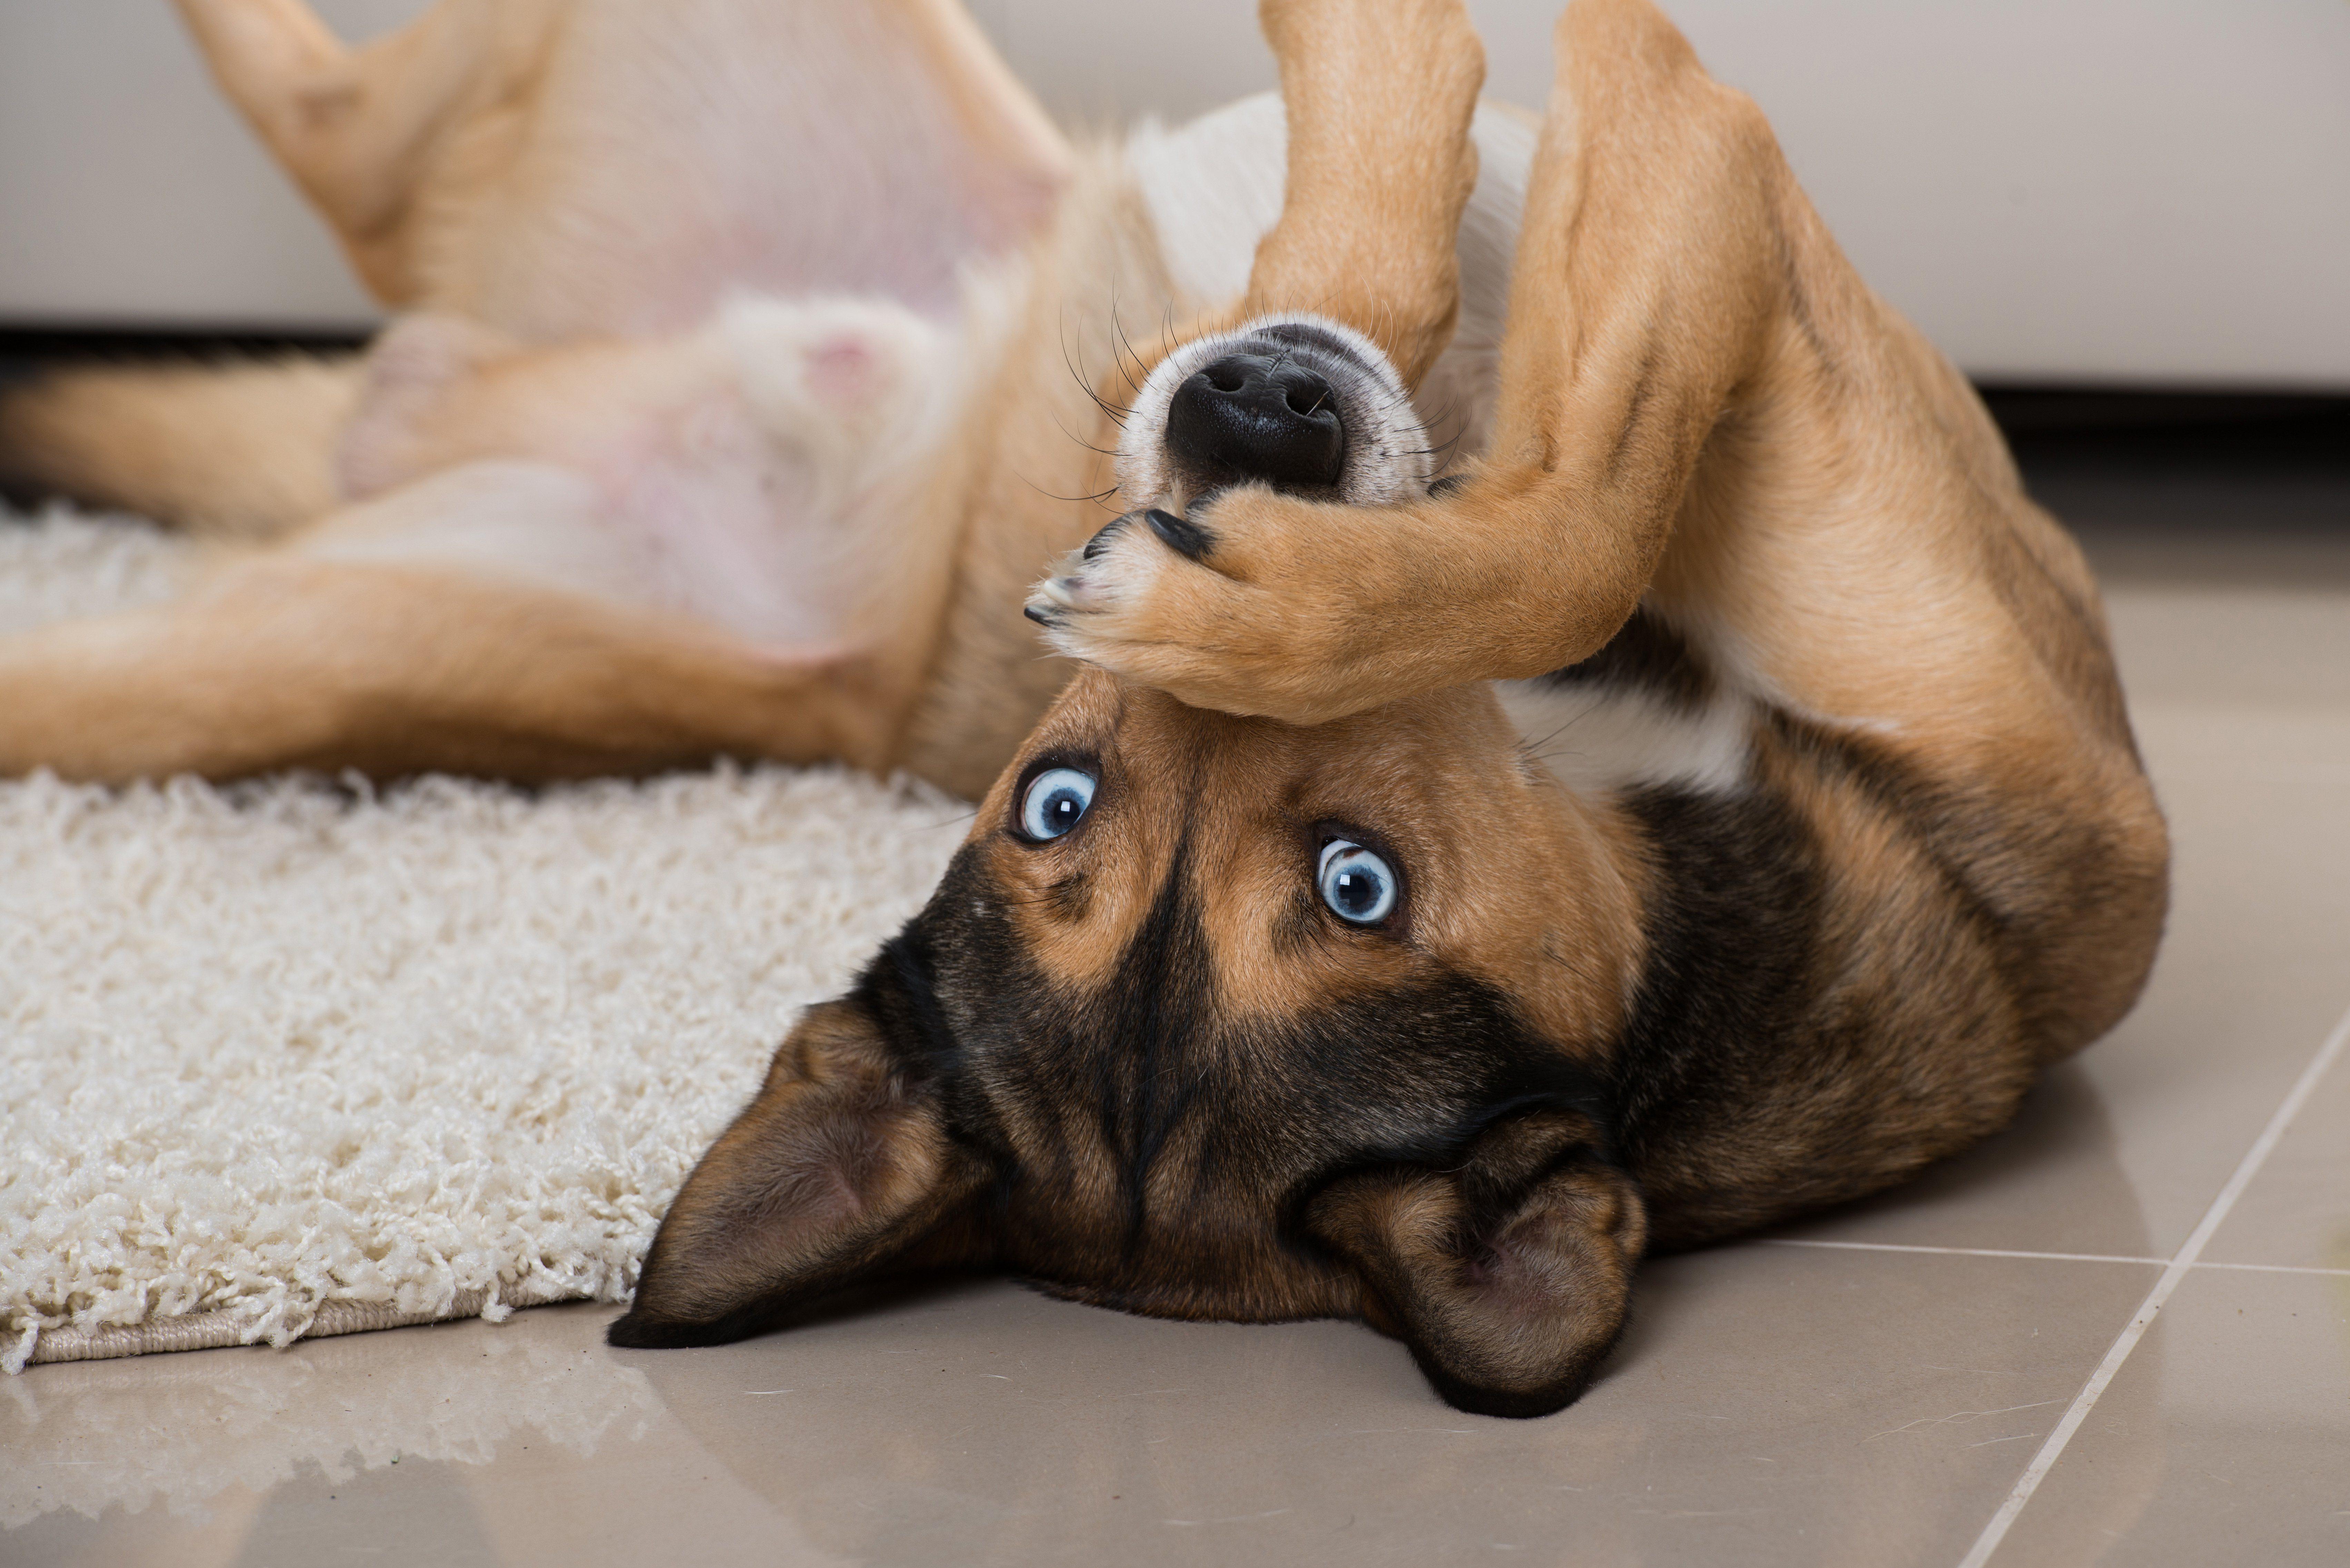 14 Reasons You Should Consider Adopting an Older Dog